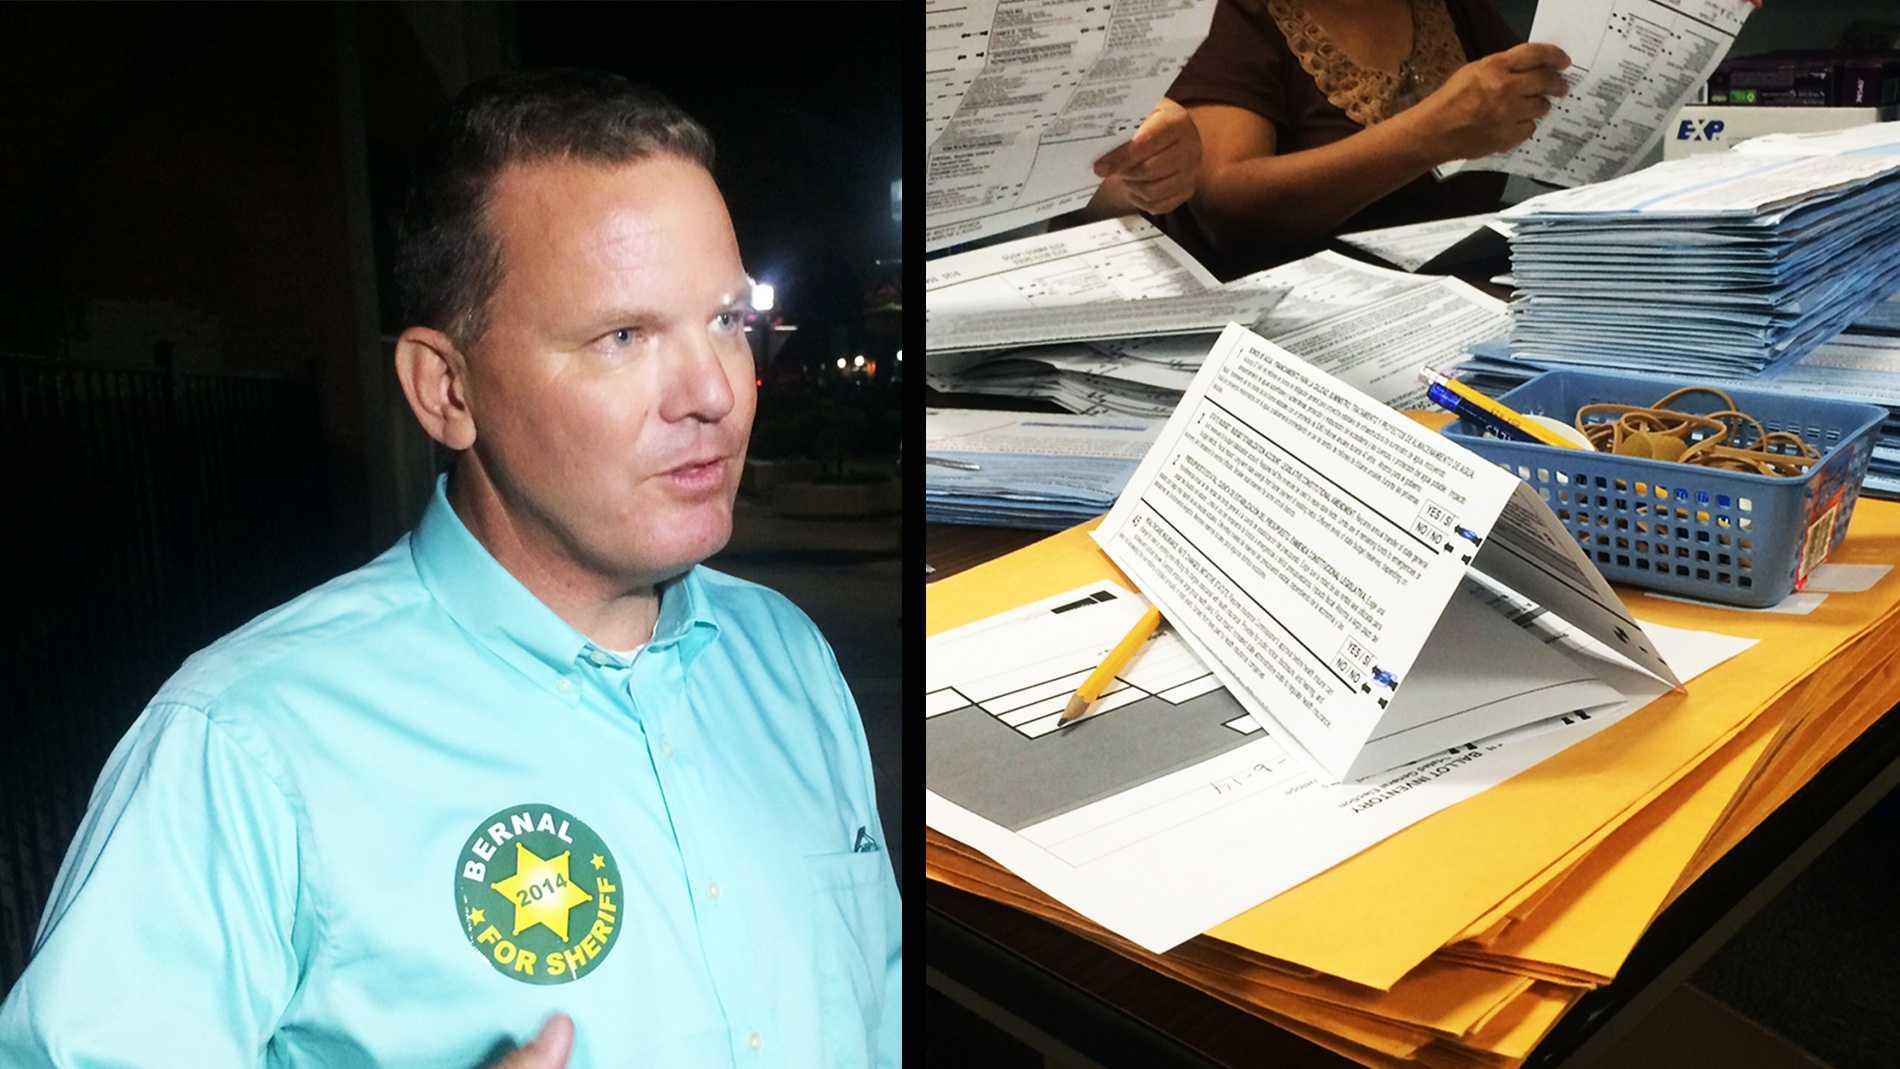 Deputy Steve Bernal / Monterey County ballots being counted.